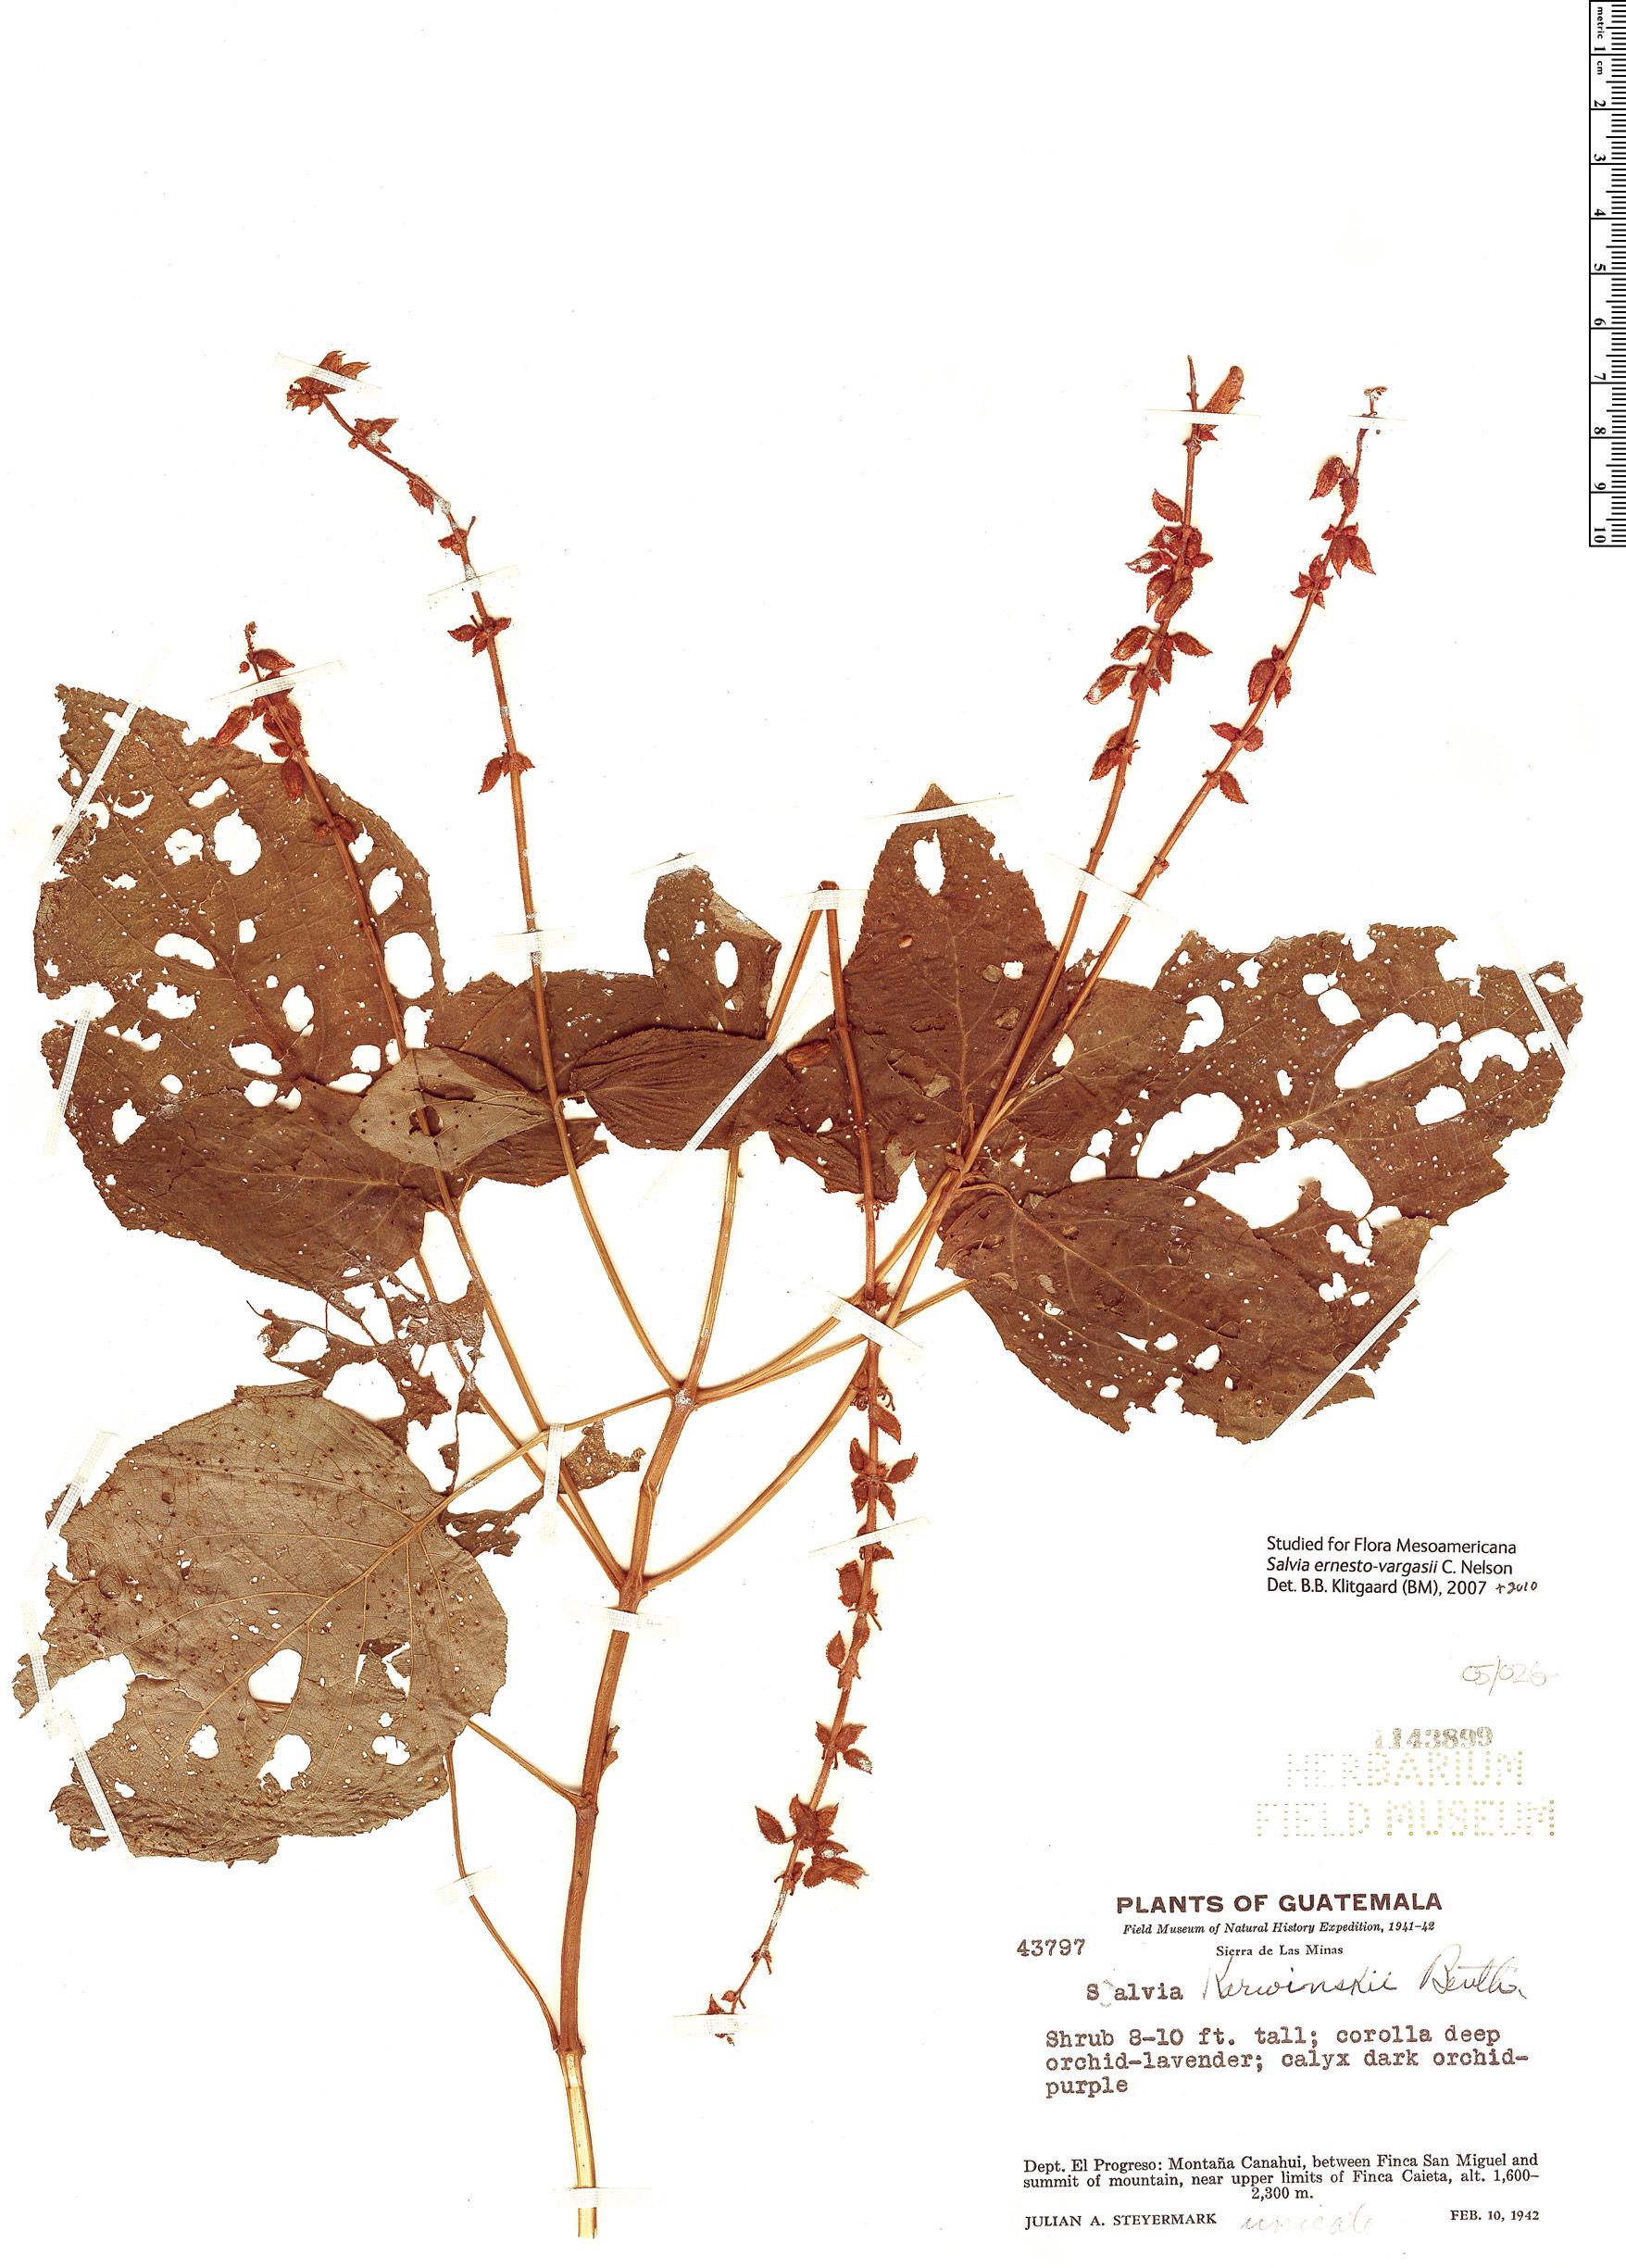 Specimen: Salvia ernesti-vargasii